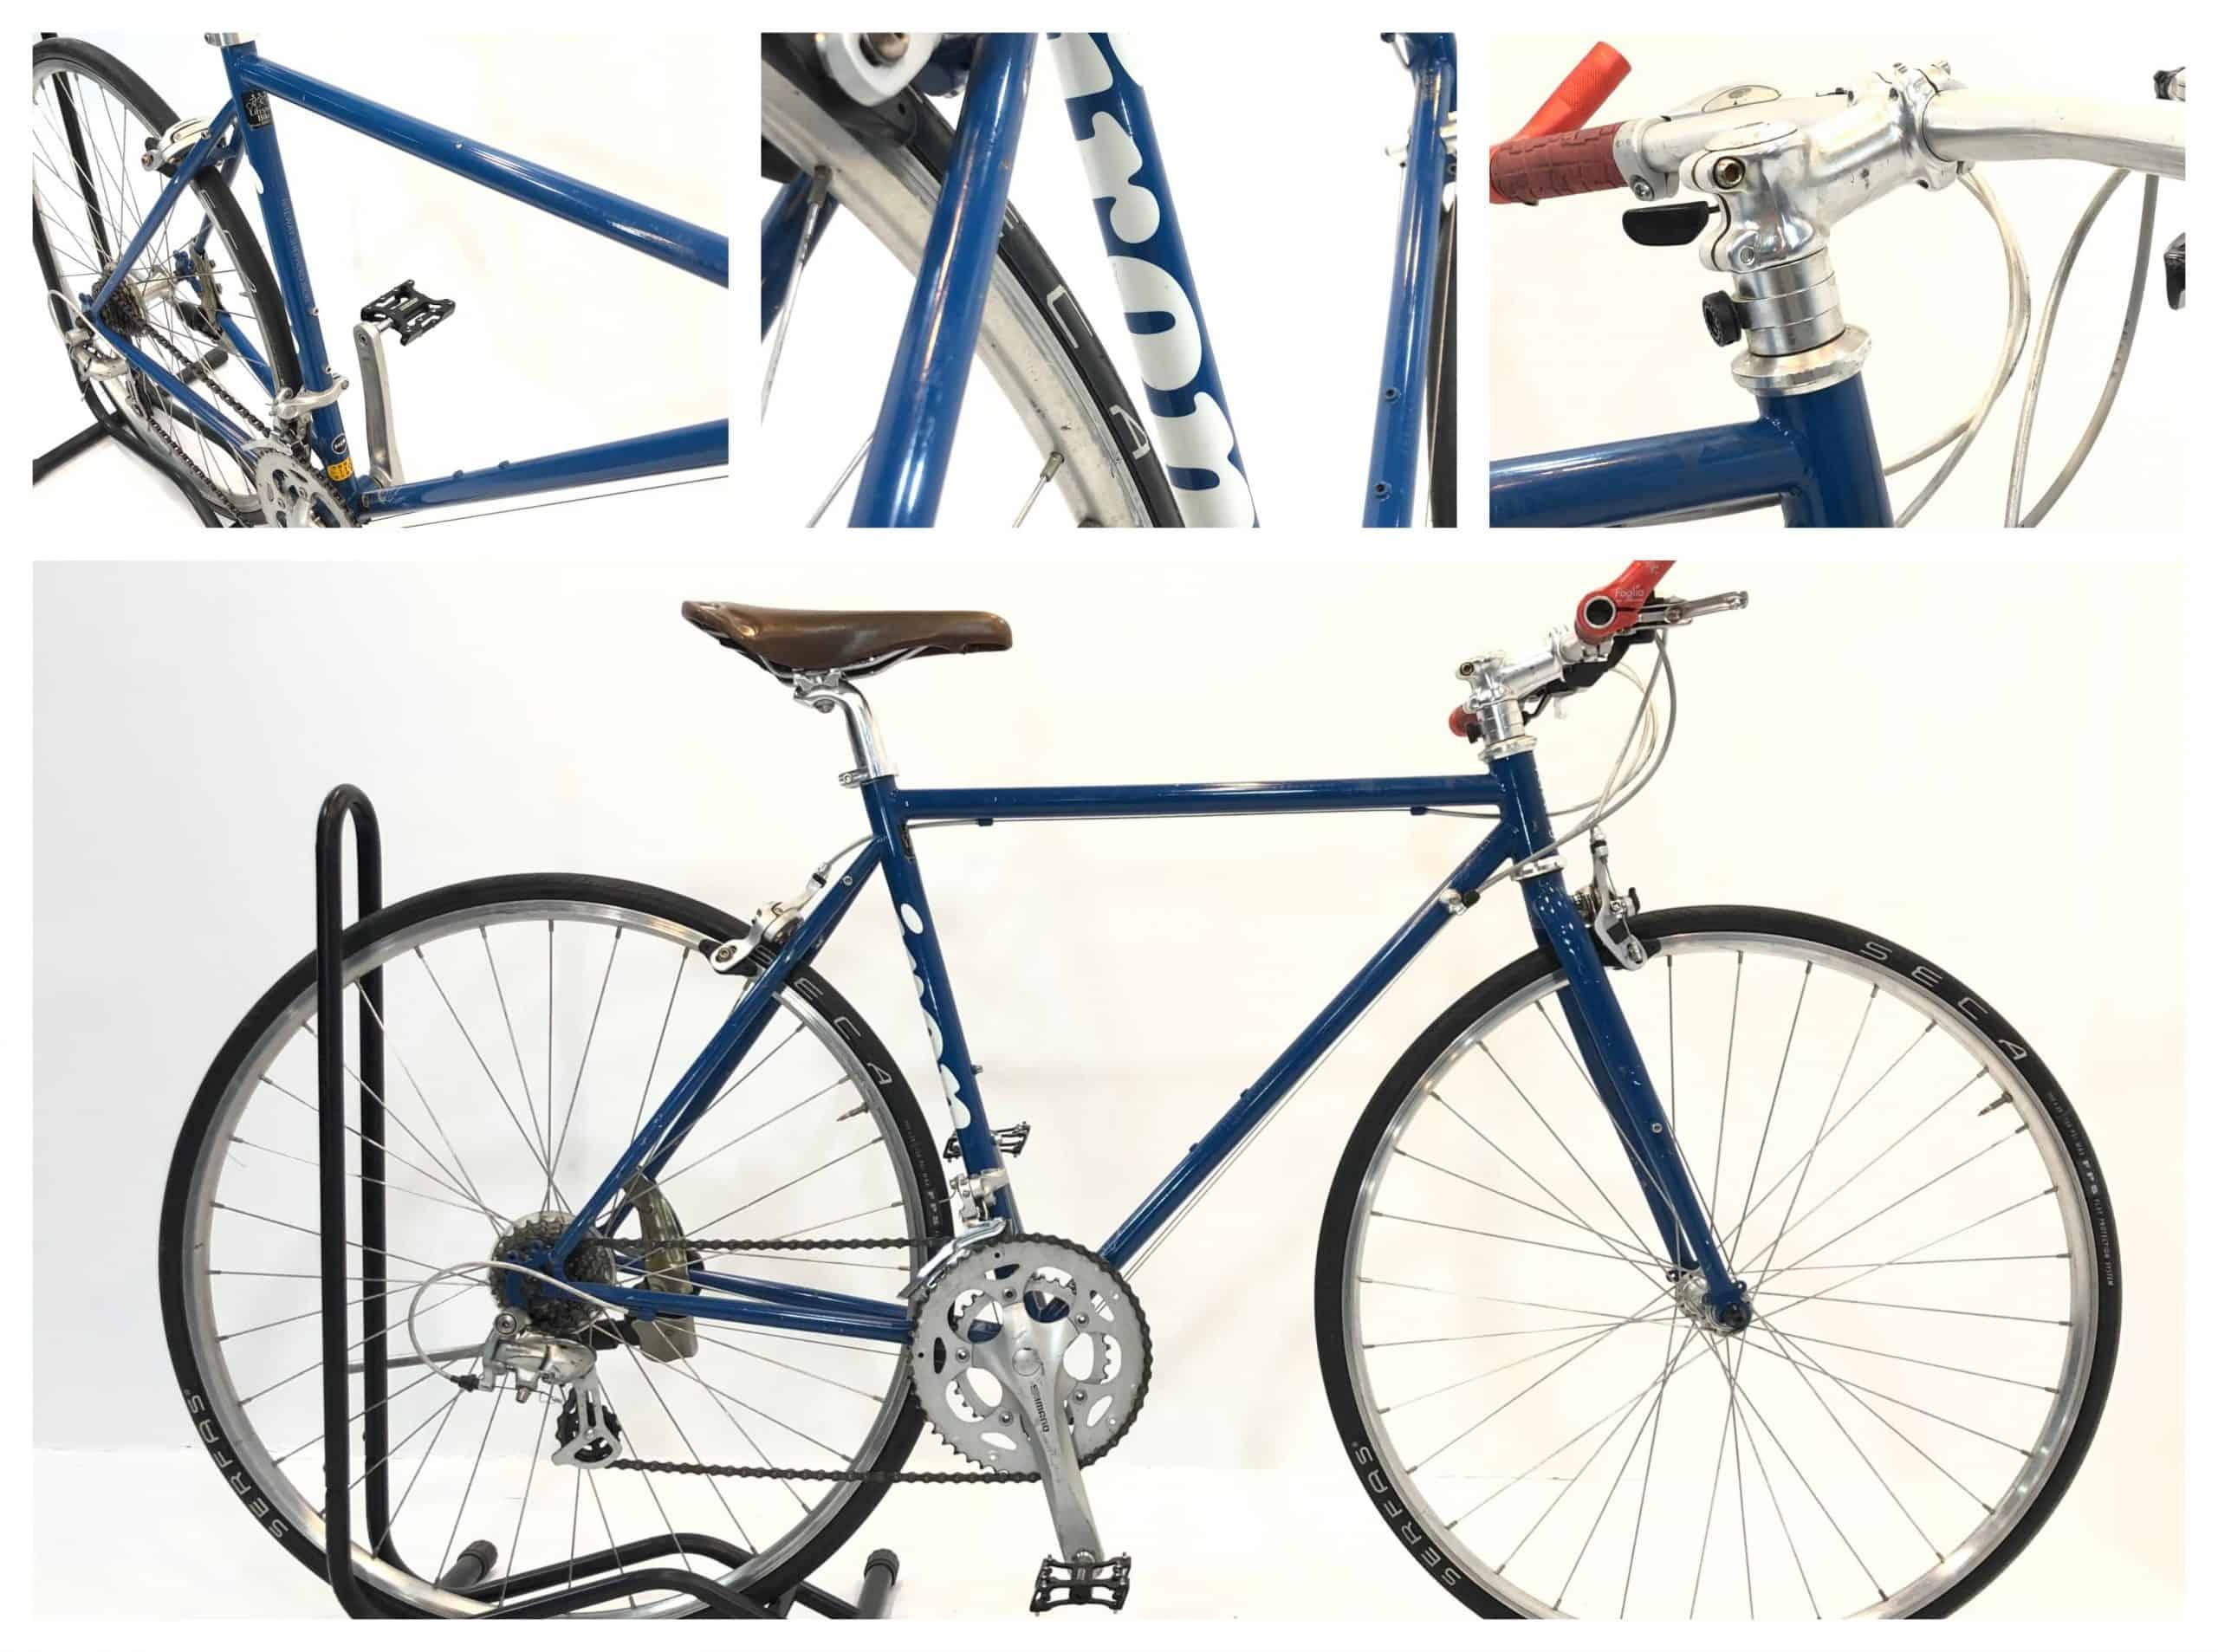 luot bike vo van lua chon